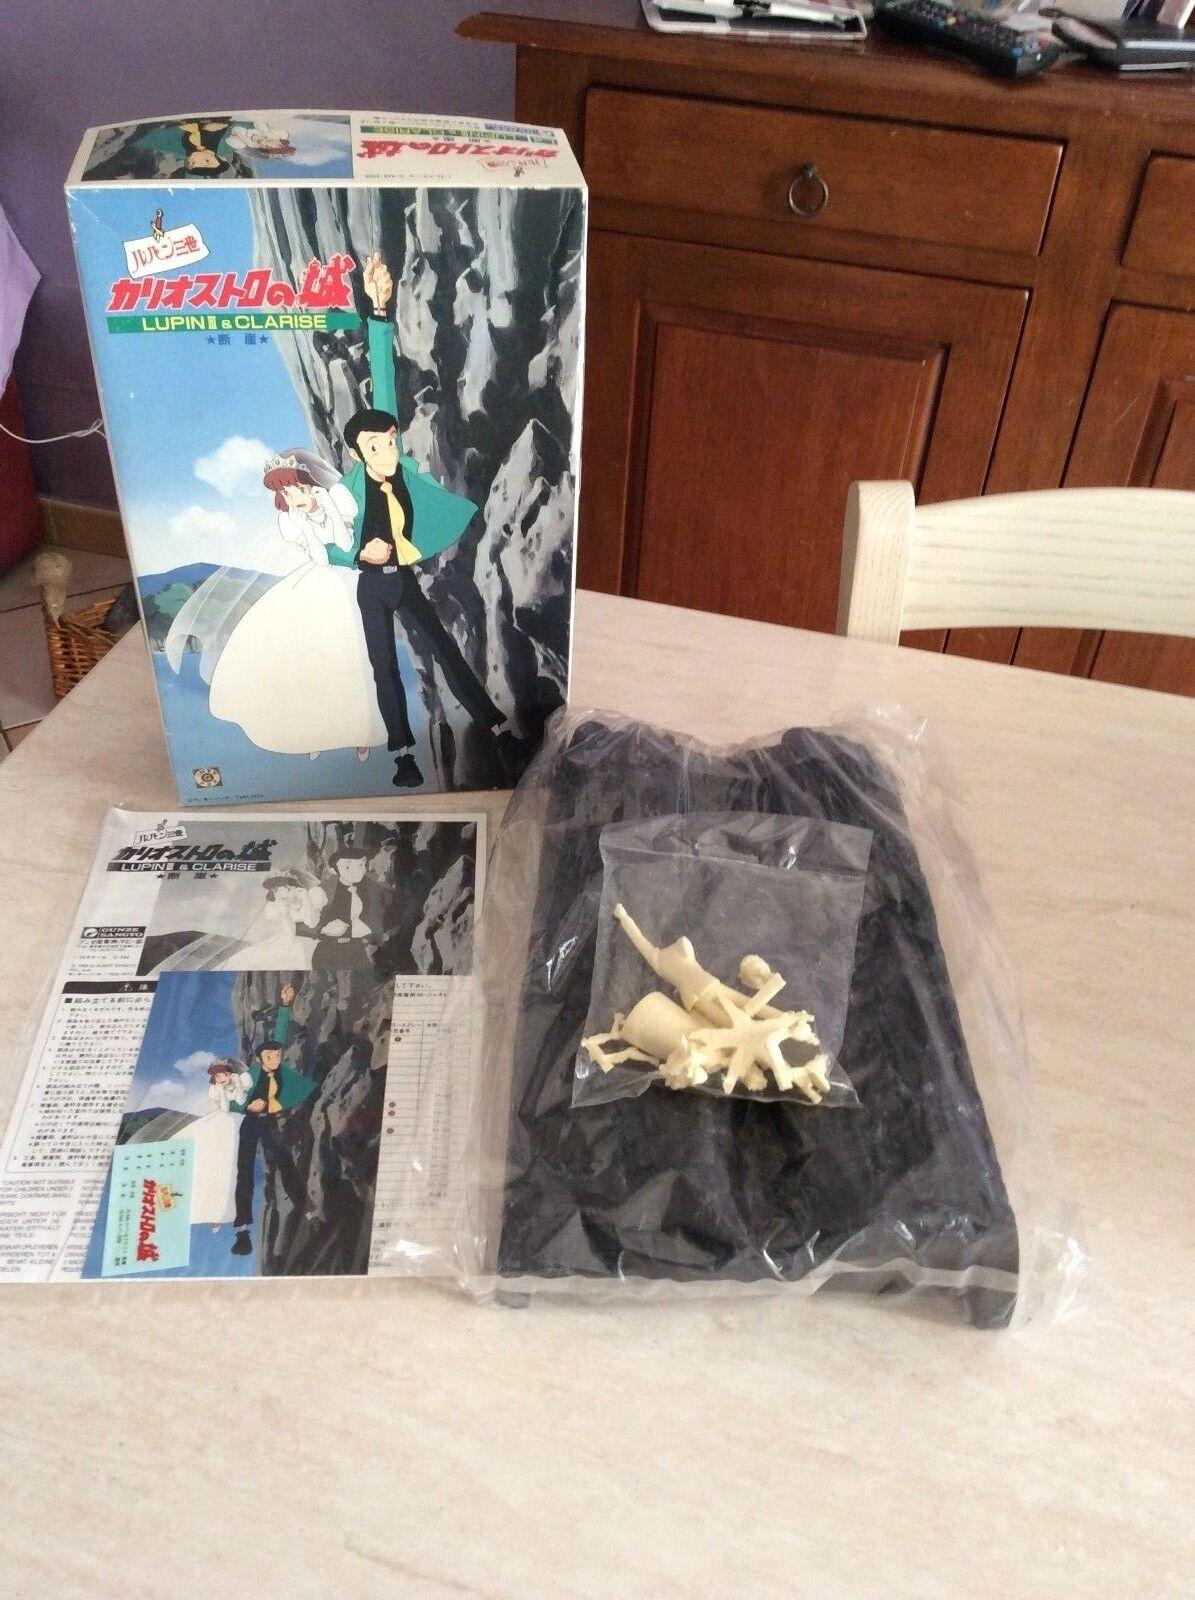 Rarissimo kit montaggio lupin e clarisse gunze sangyo 1996 nuovo 1 24 made japan